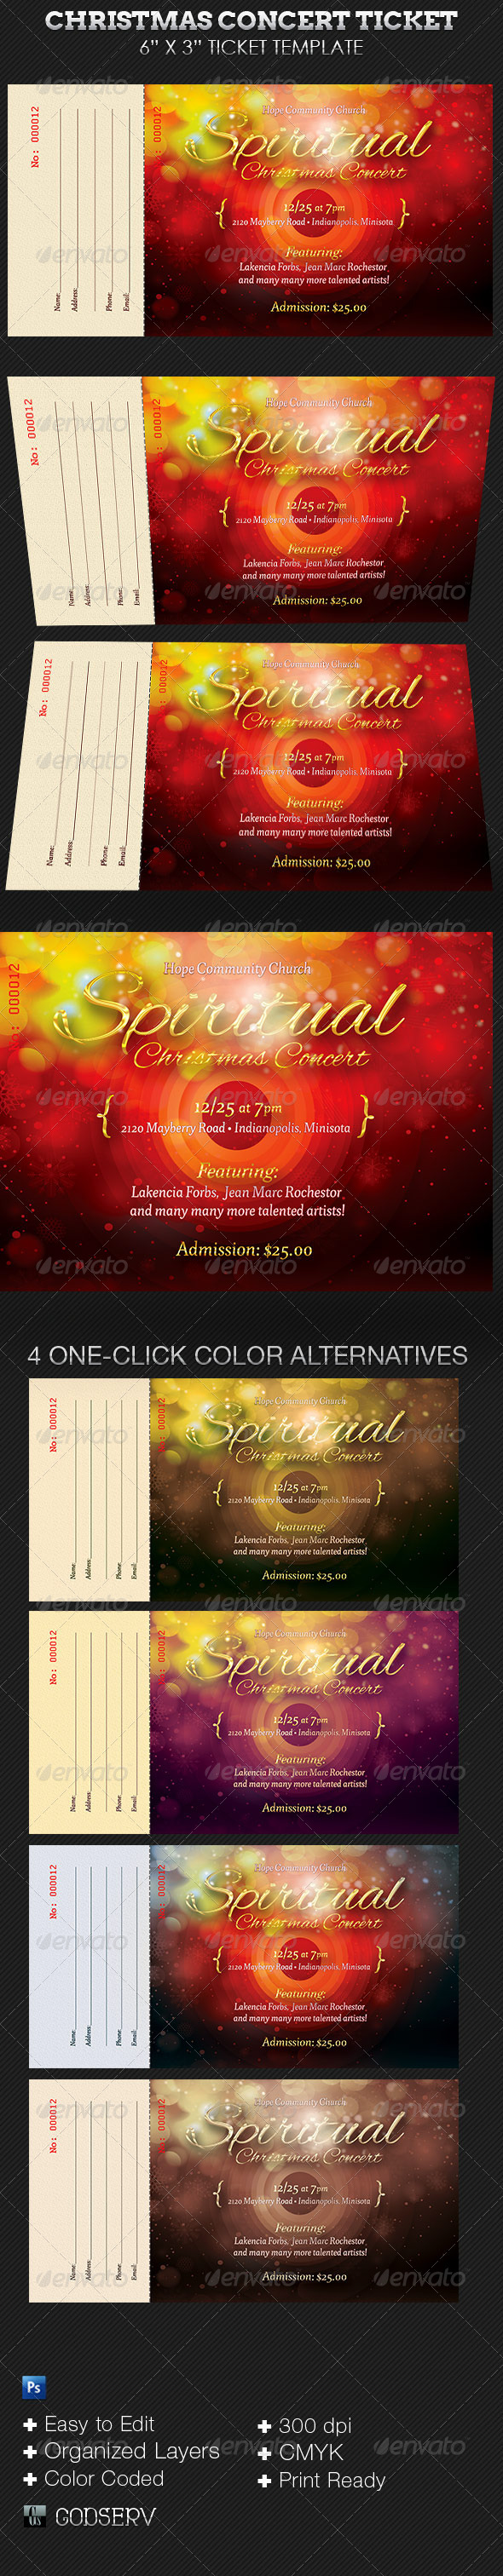 GraphicRiver Spiritual Christmas Concert Ticket Template 5874105